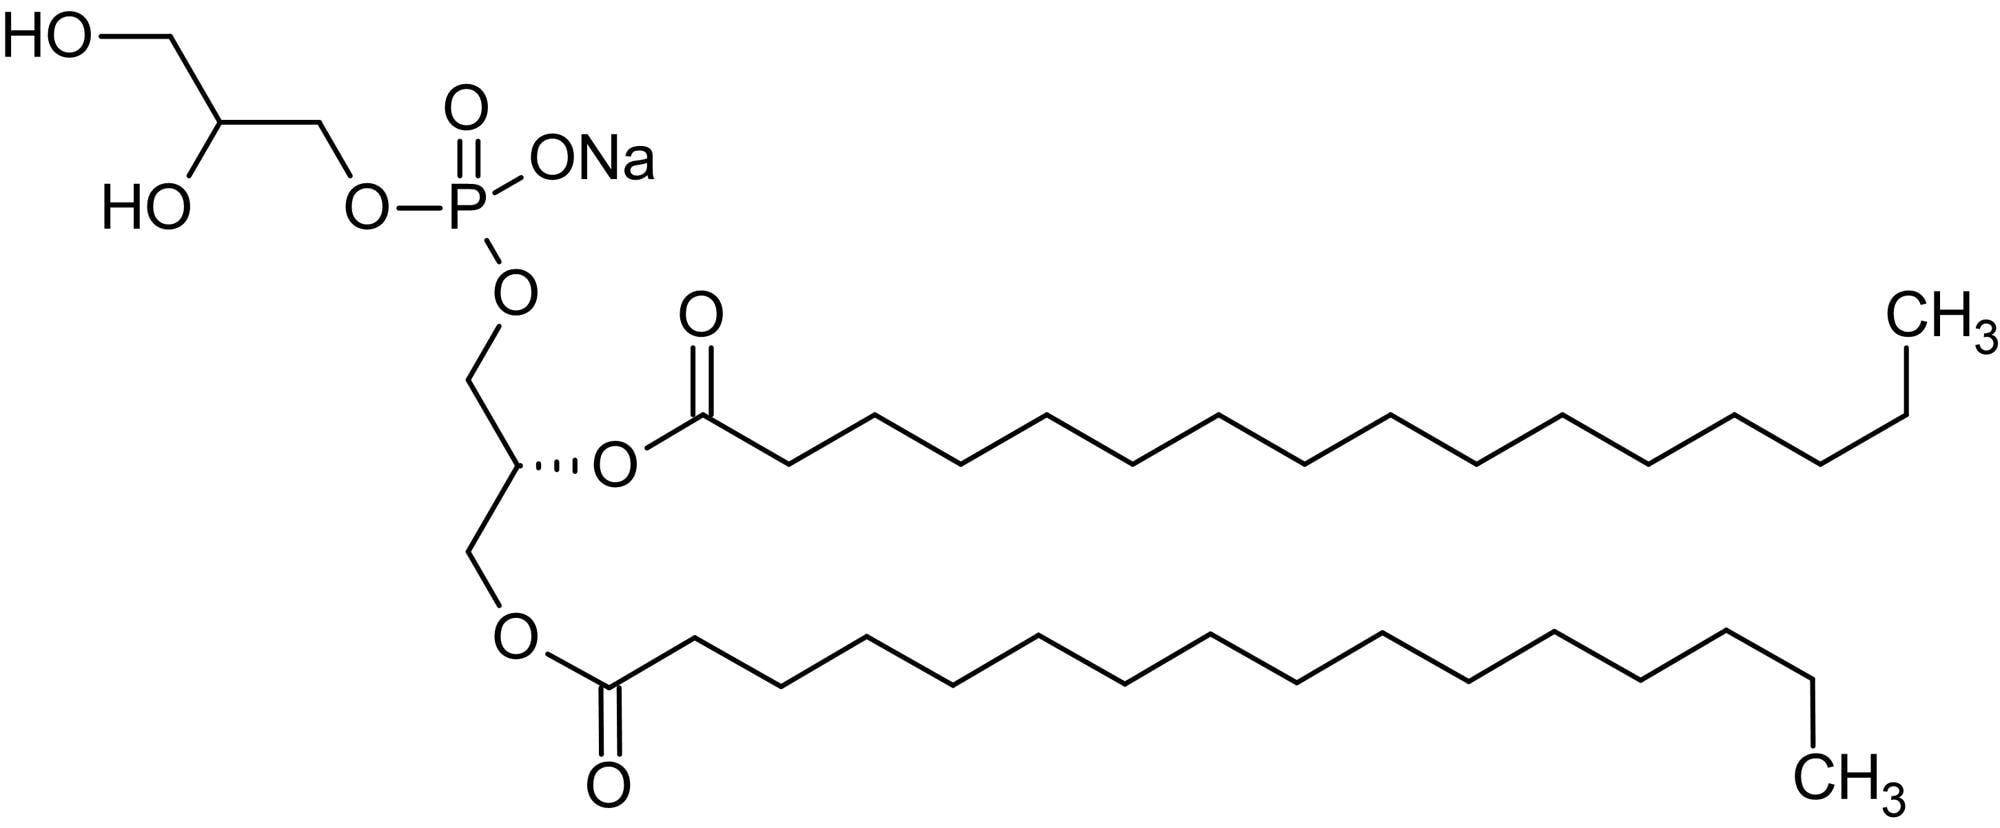 Chemical Structure - 1,2-Dipalmitoyl-sn-glycero-3-phosphorylglycerol sodium salt (DPPG), Phosphorylglycerol (ab143953)